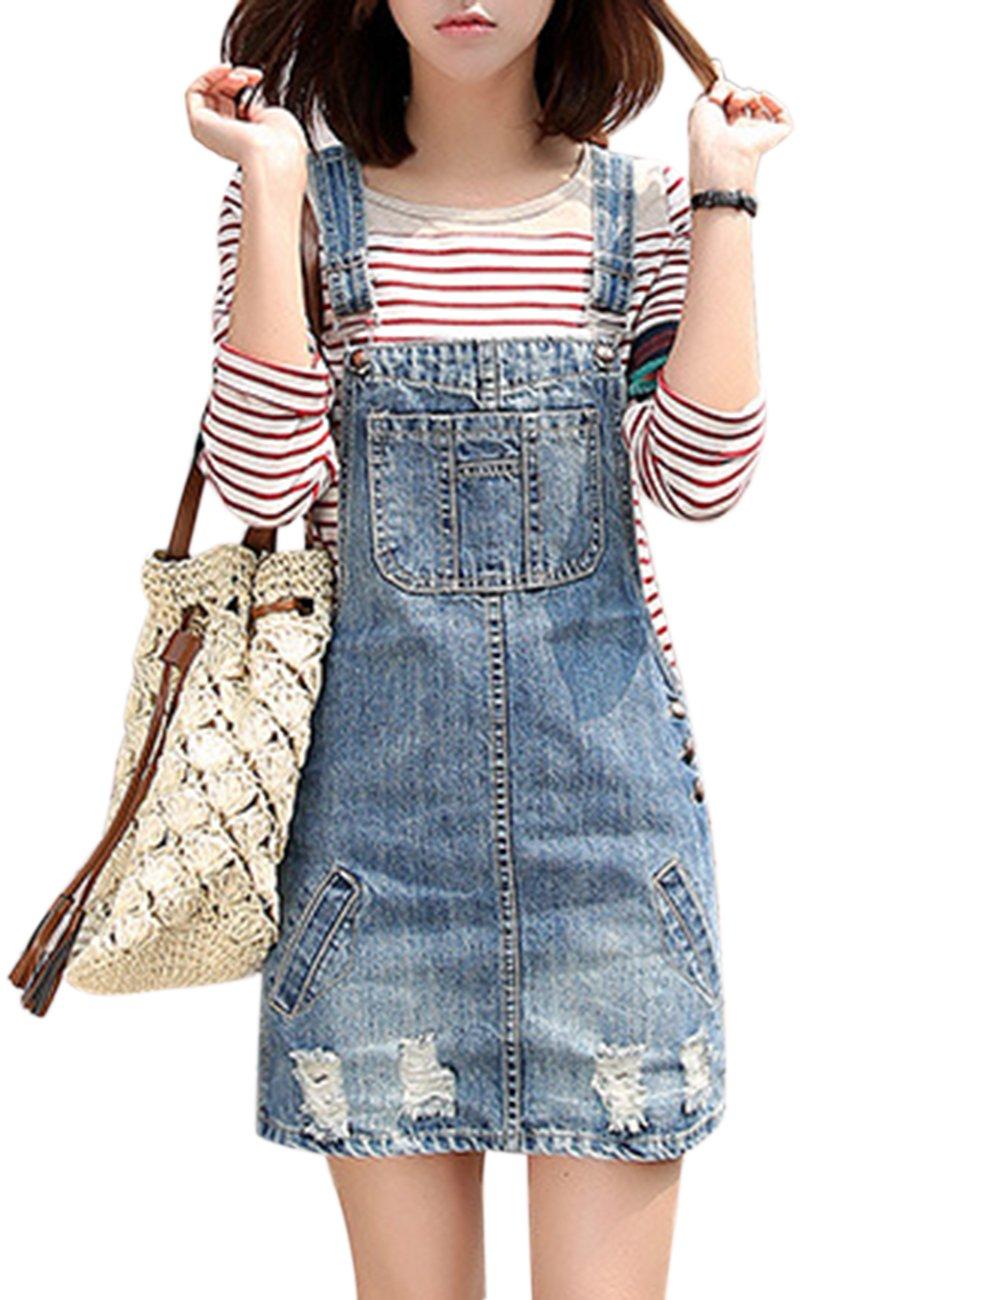 Meiyiu Women Fashion Casual Holes Denim Skirt Shoulder Strap Suspender Skirt Blue M